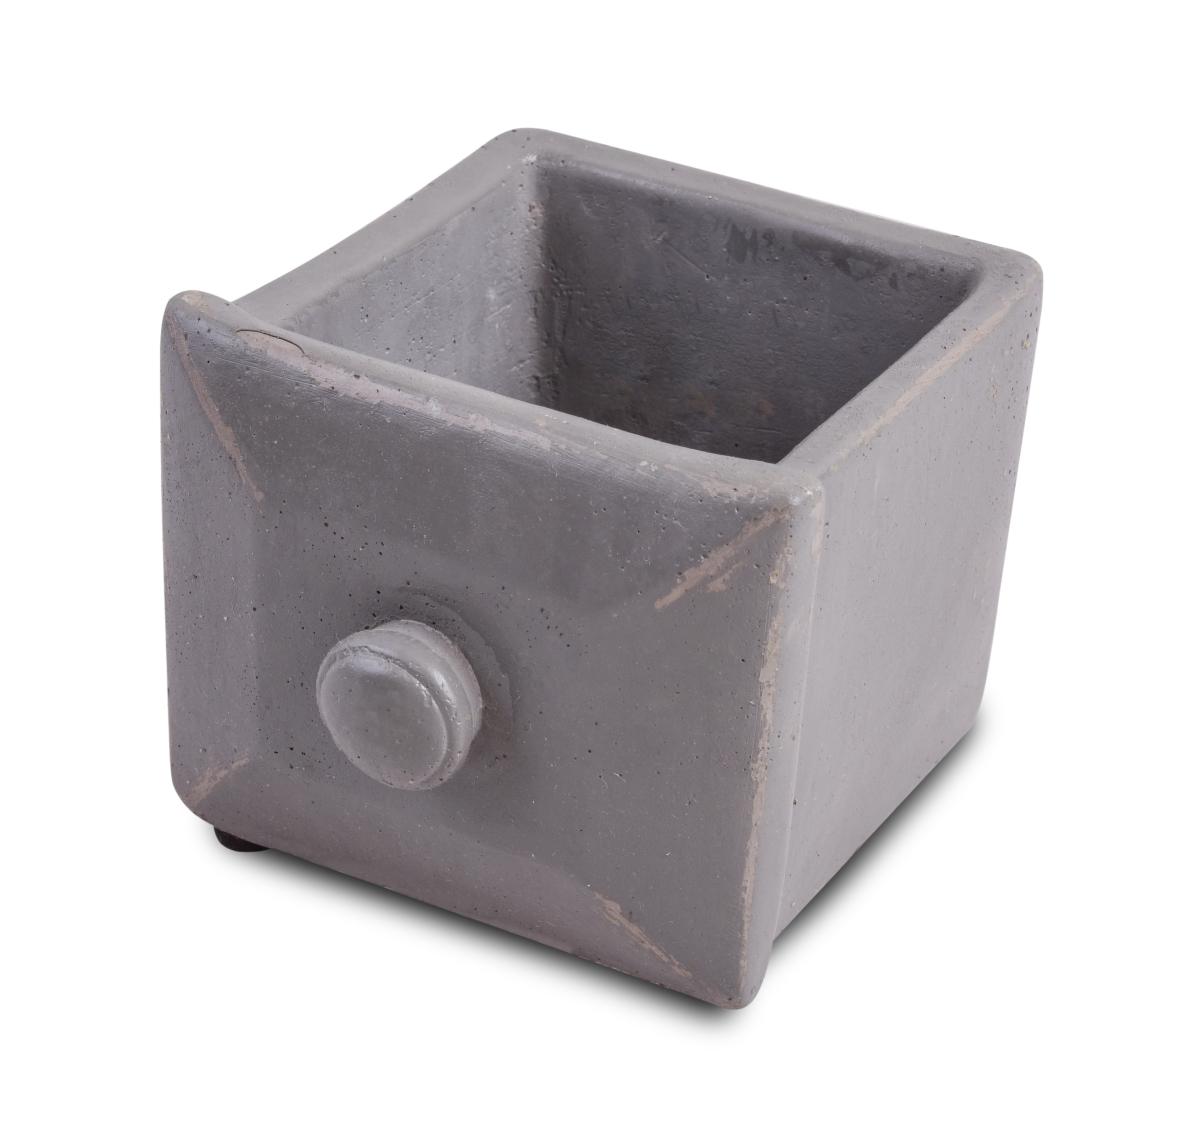 Kameninový obal na květináč  čtvercový, šedý